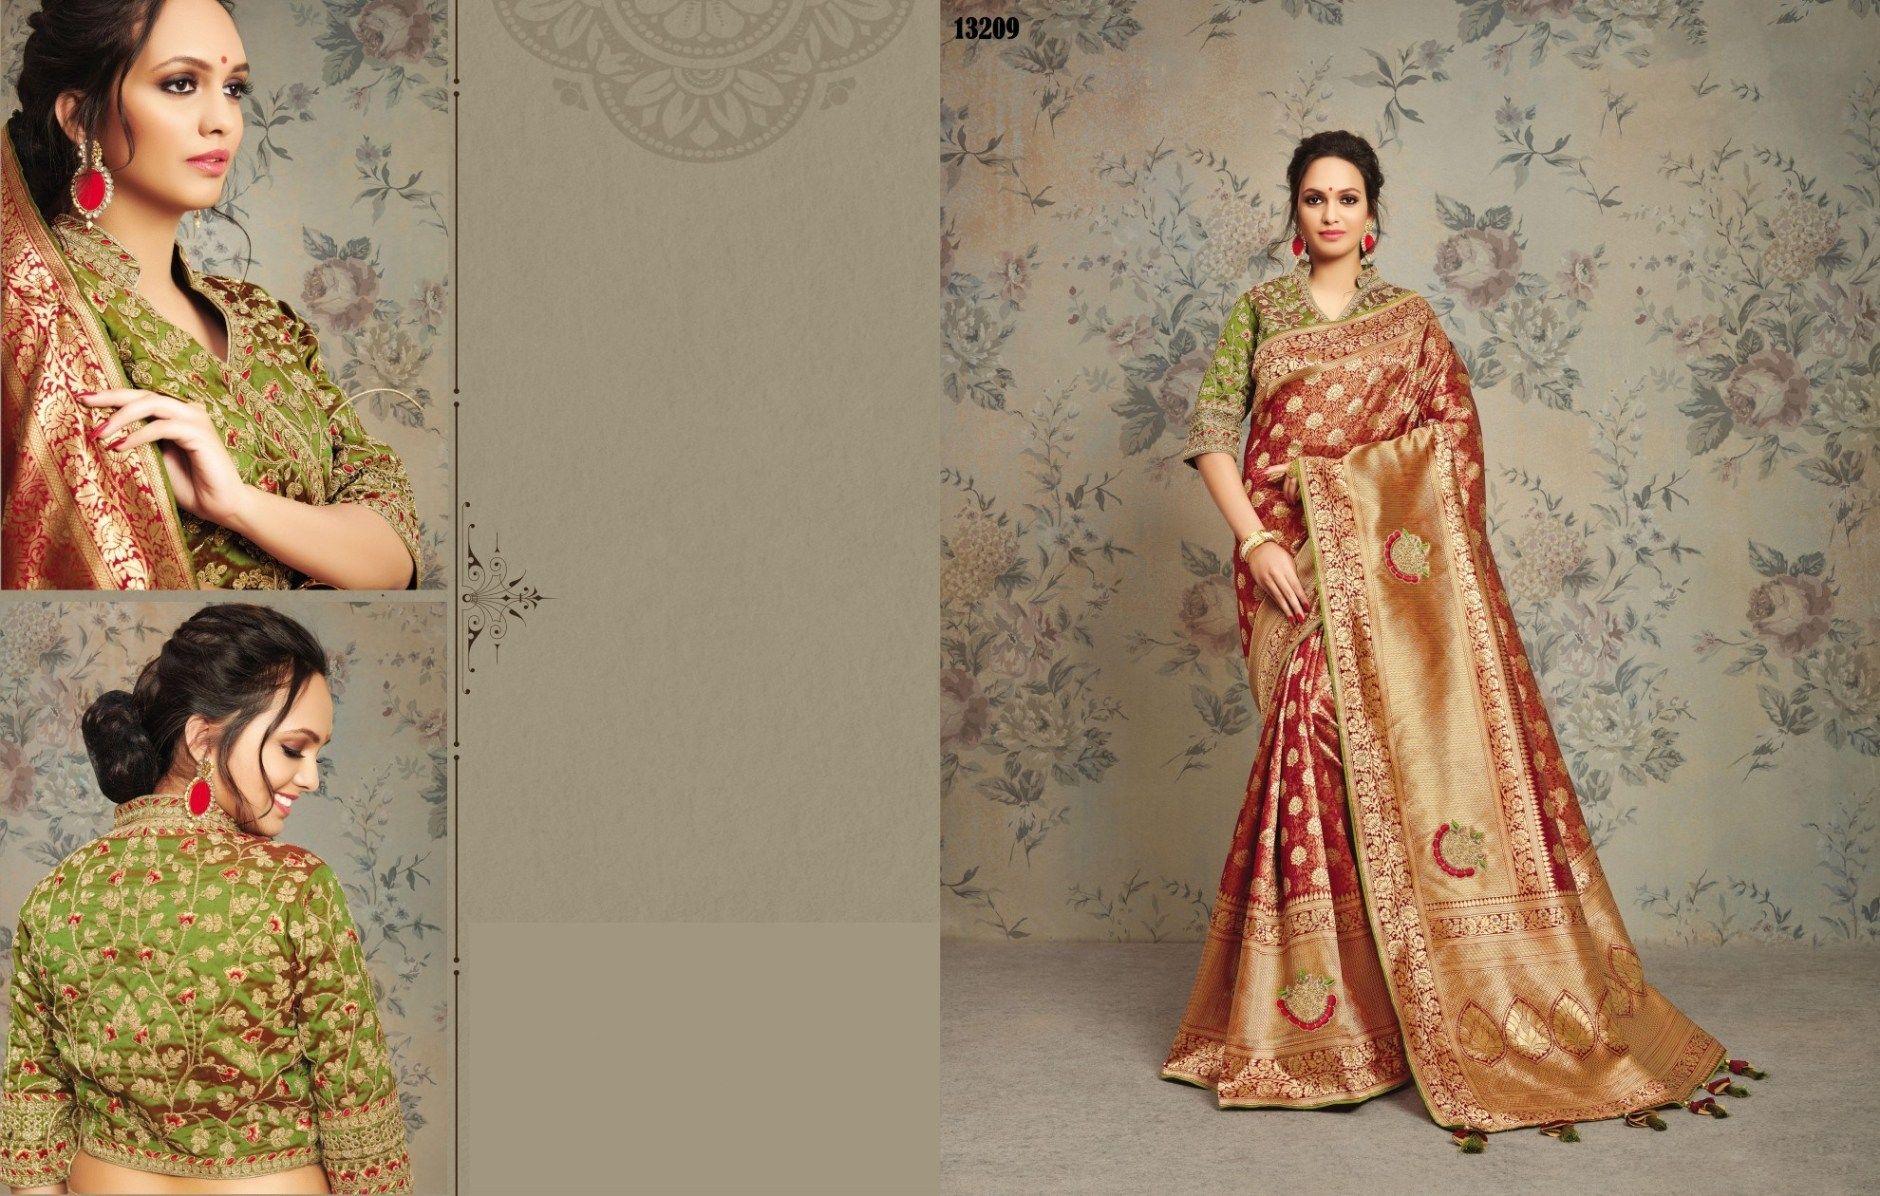 0b266268b4 AARYAHI MAHOTSAV LATEST DESIGNER SAREES COLLECTION 2019   Ethnic Export    Saries in 2019   Designer sarees collection, Latest designer sarees, Saree  ...